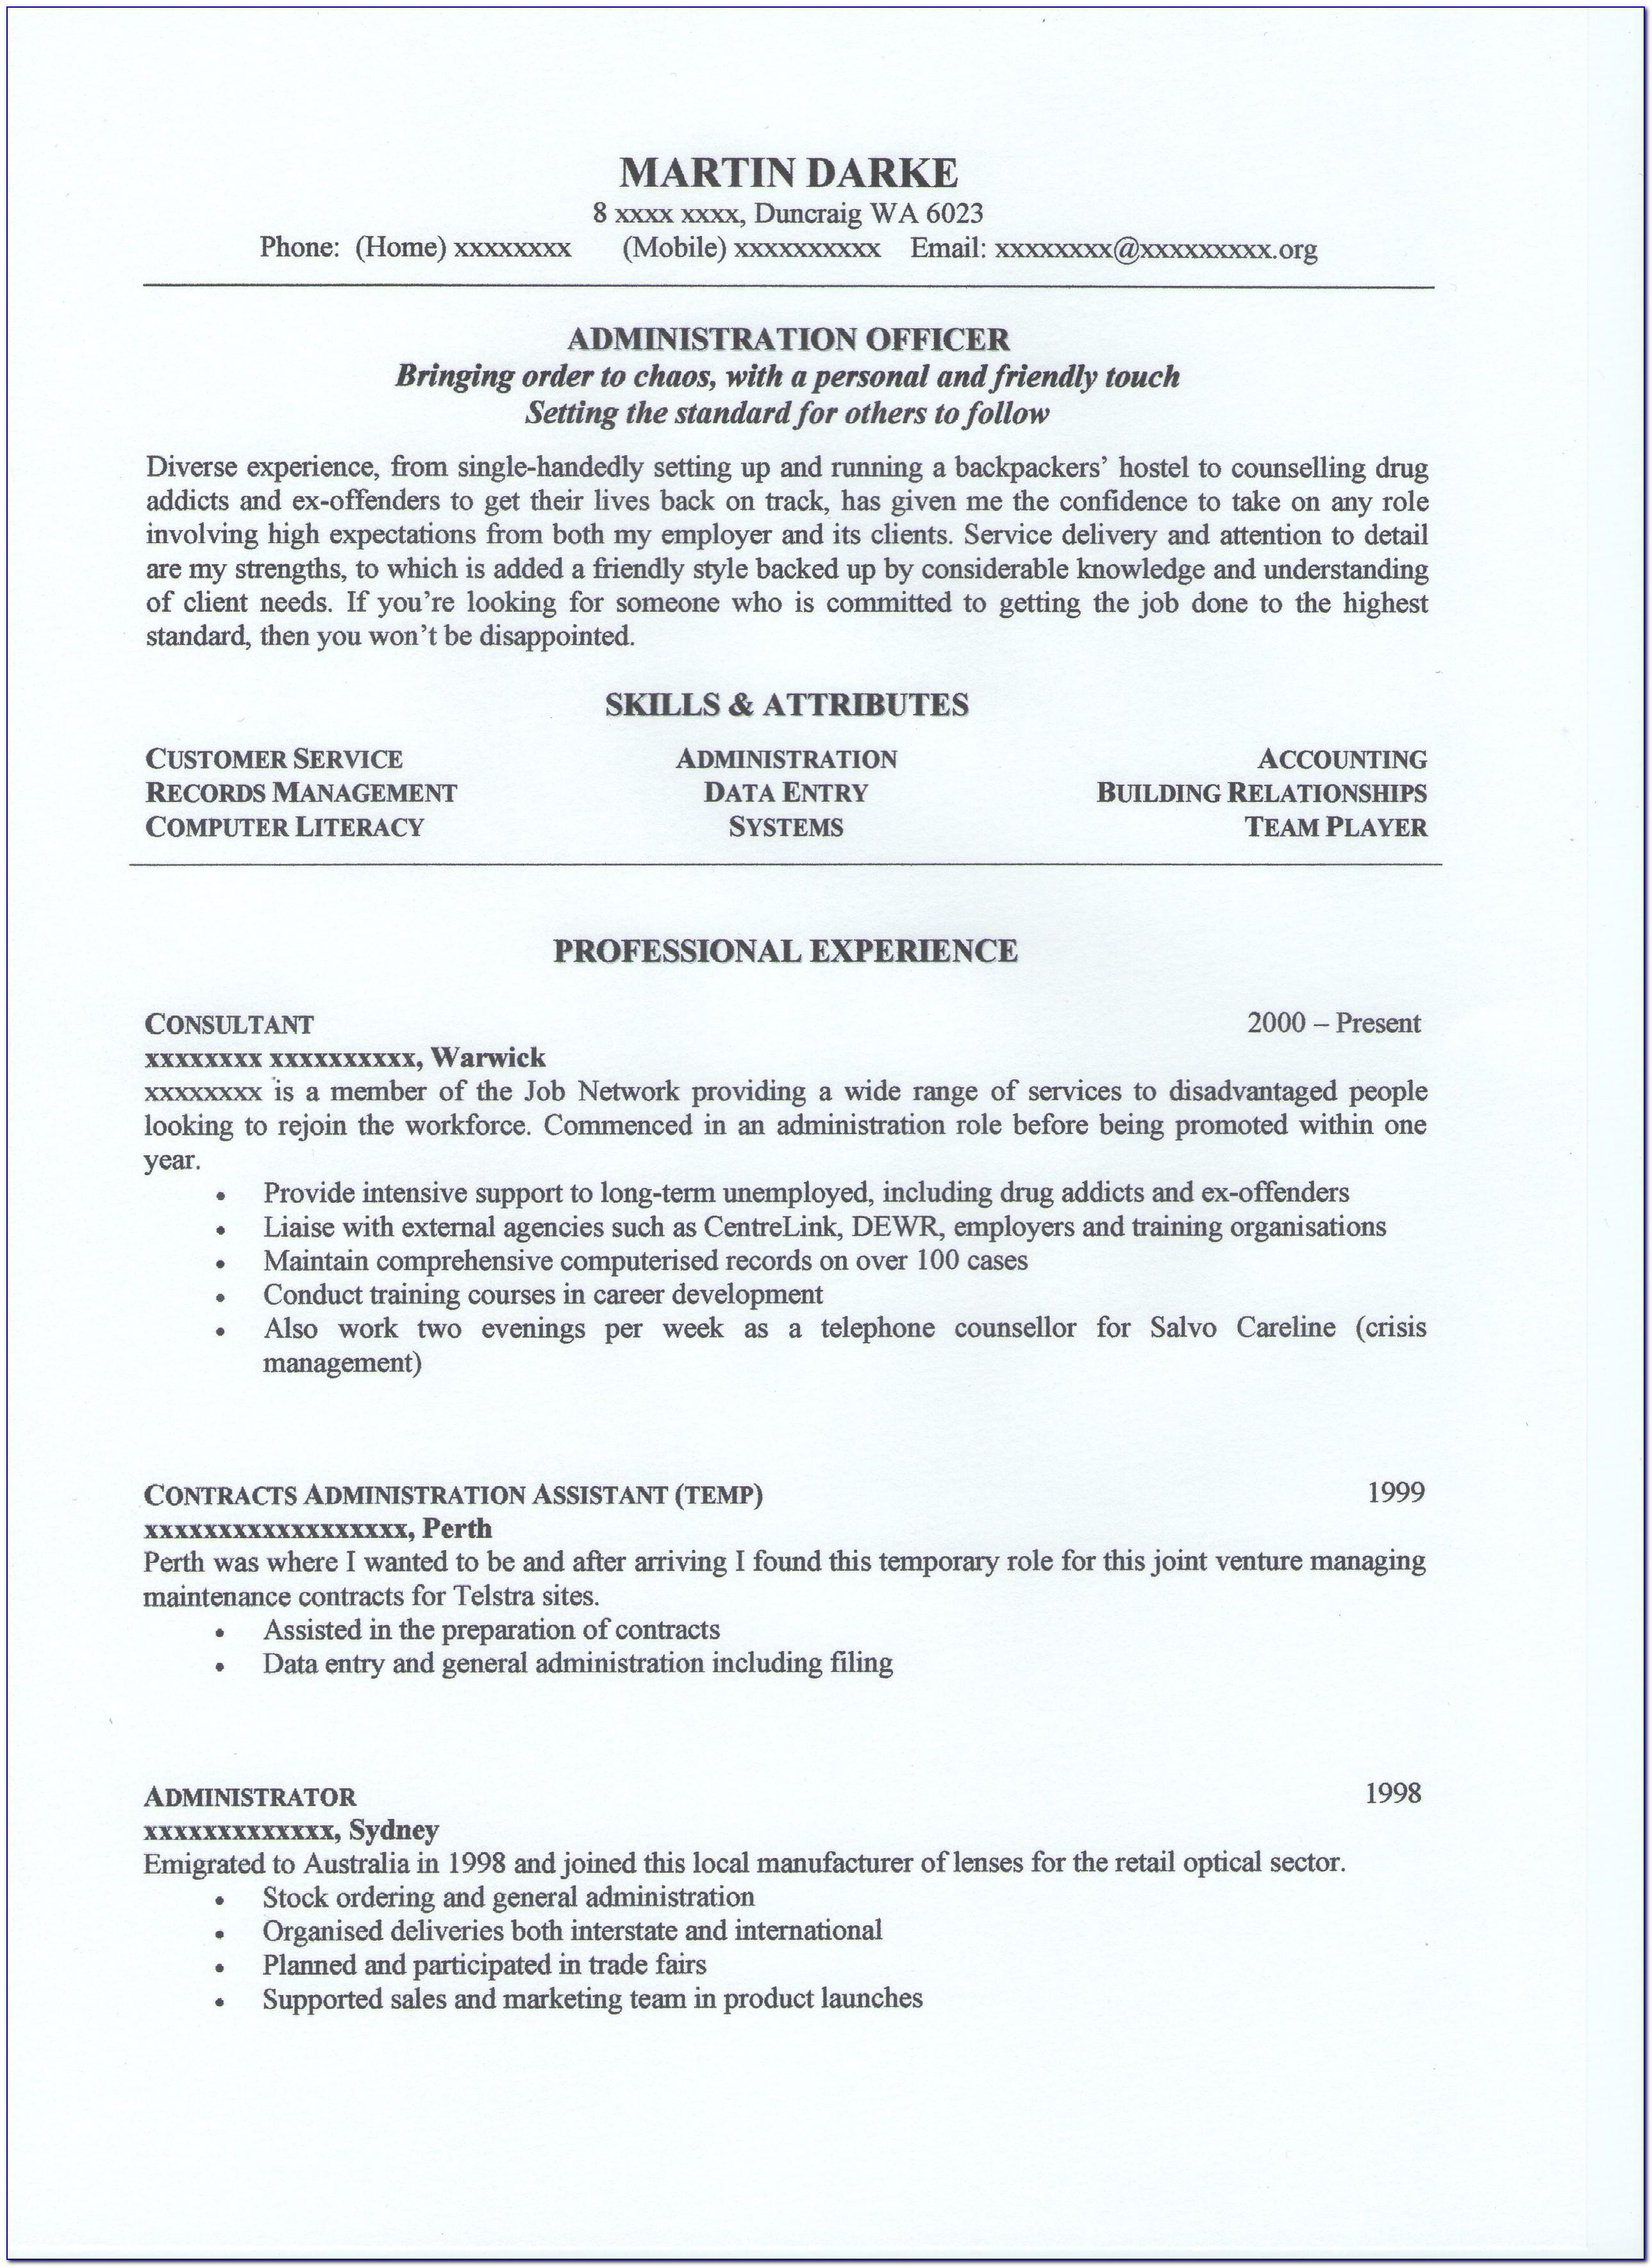 2018 Professional Resume Layout Australia Word Template